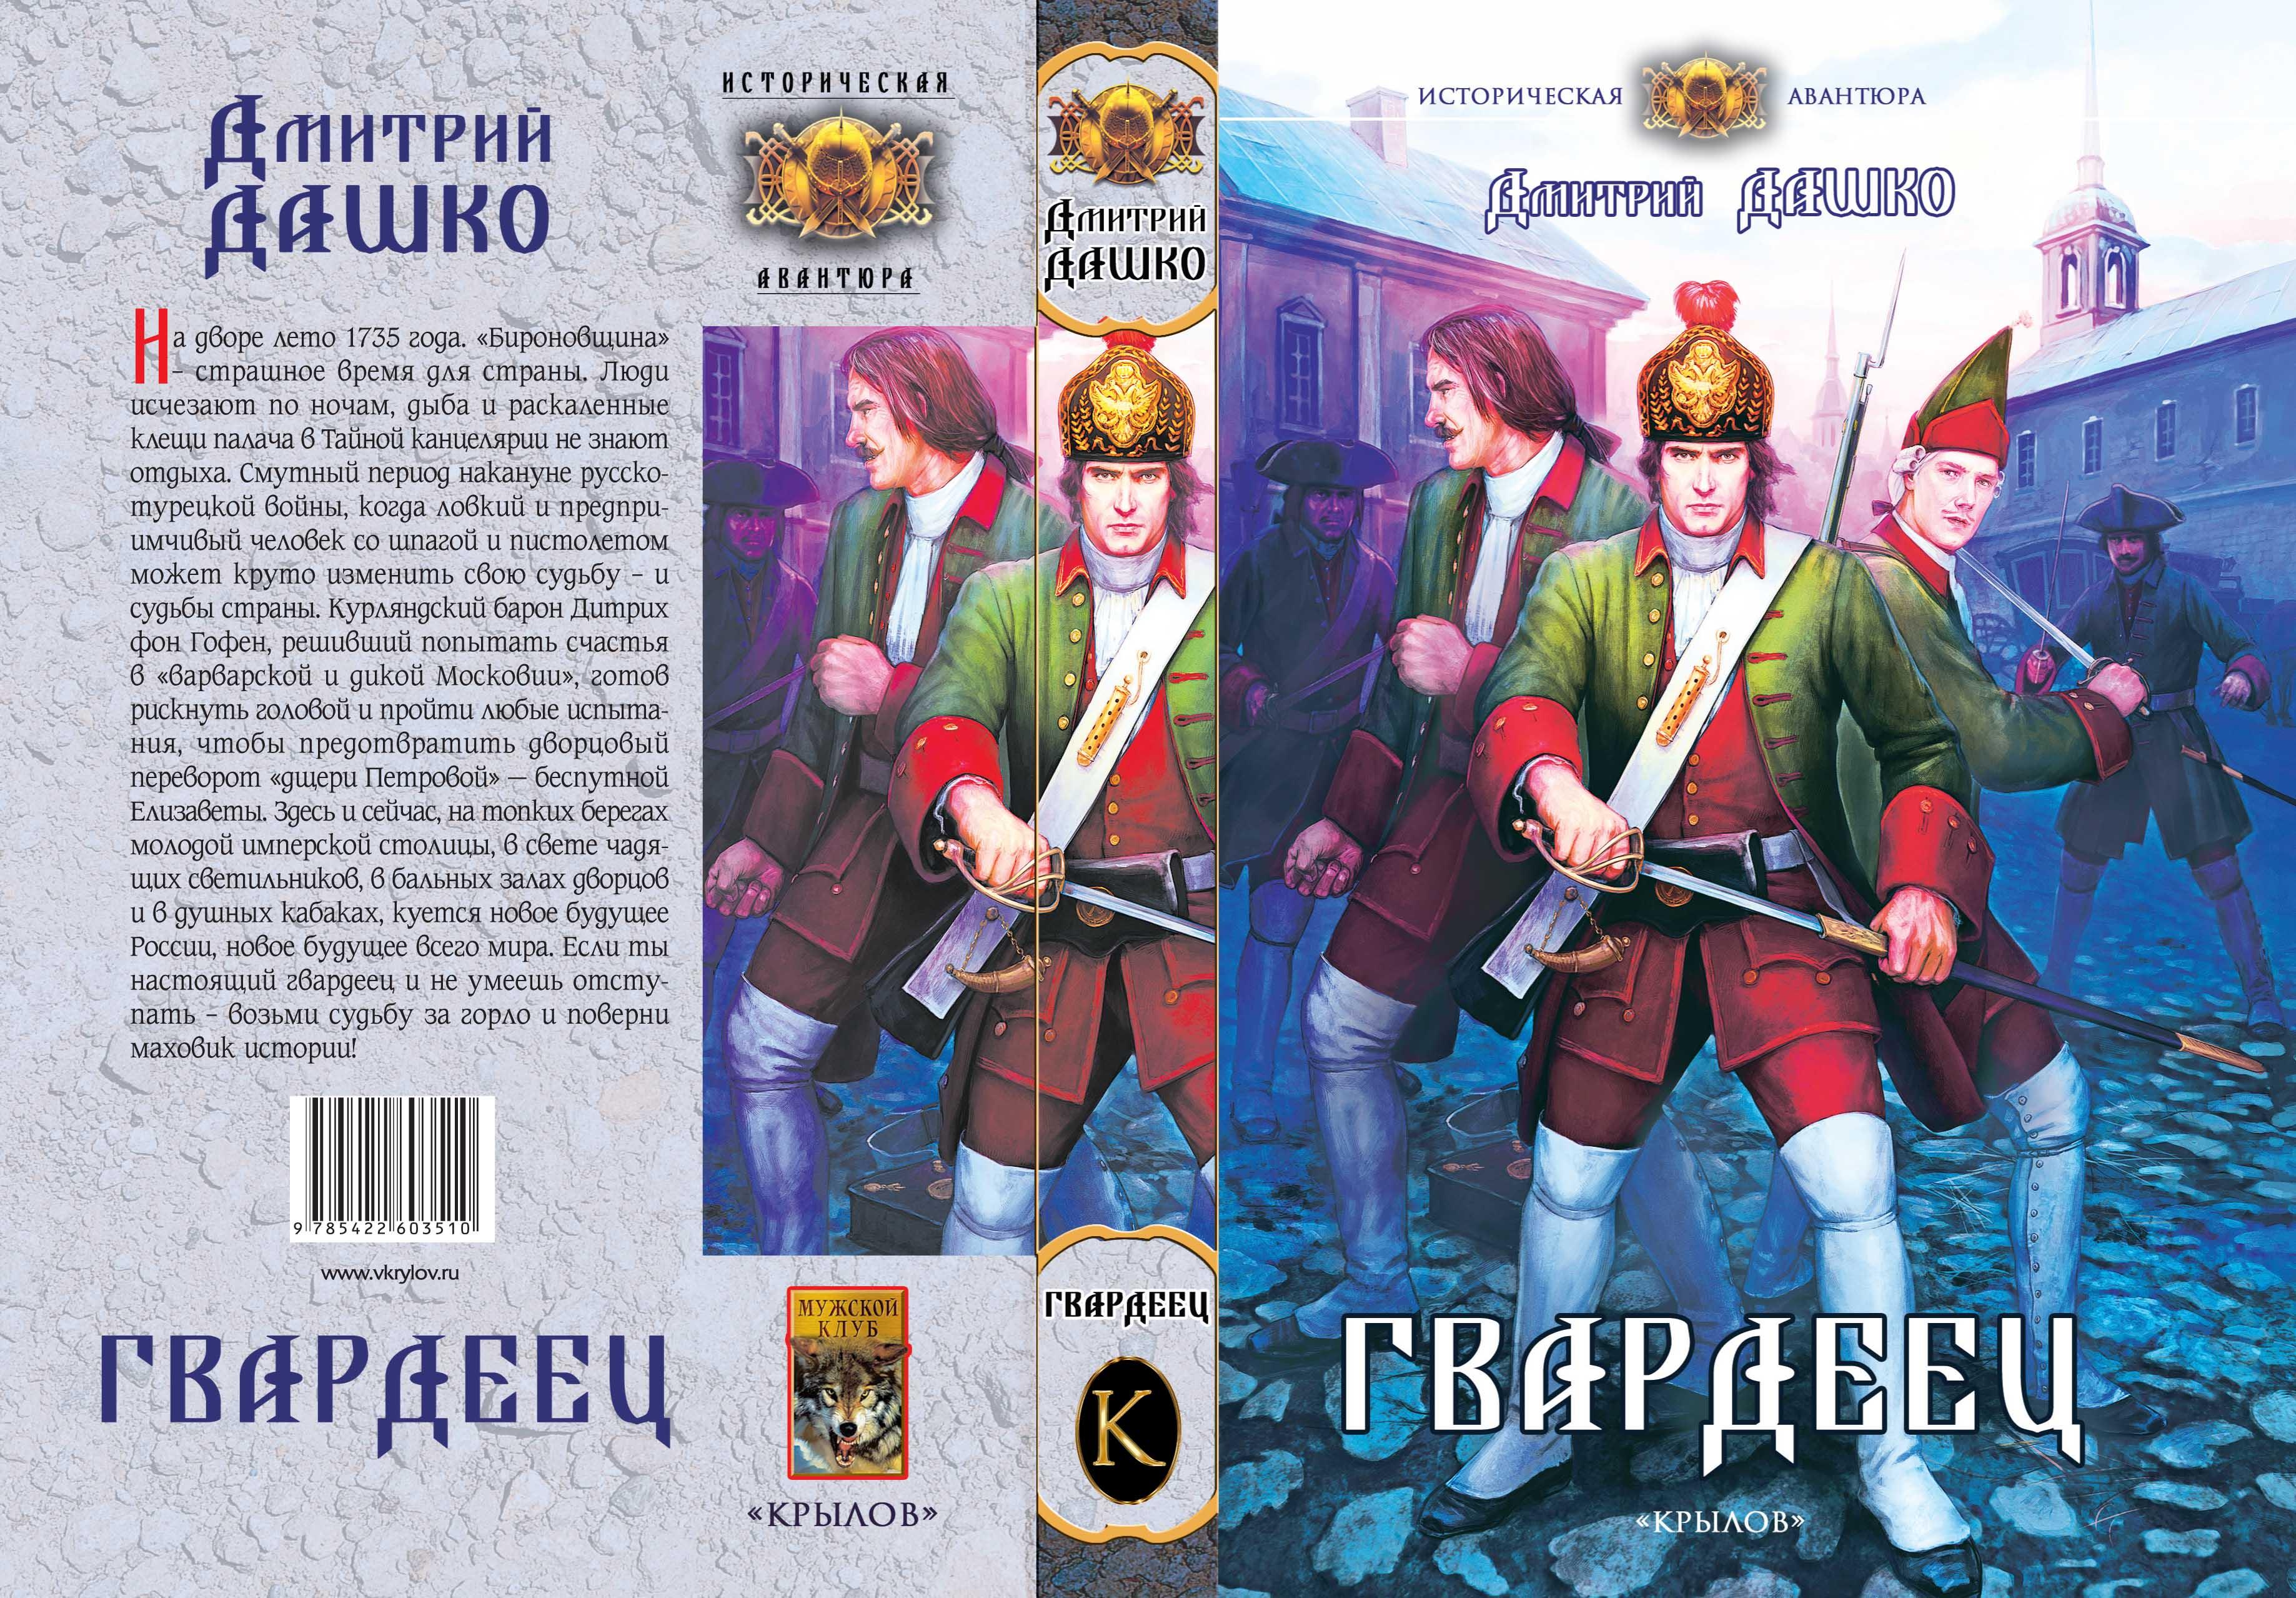 Гвардеец-1